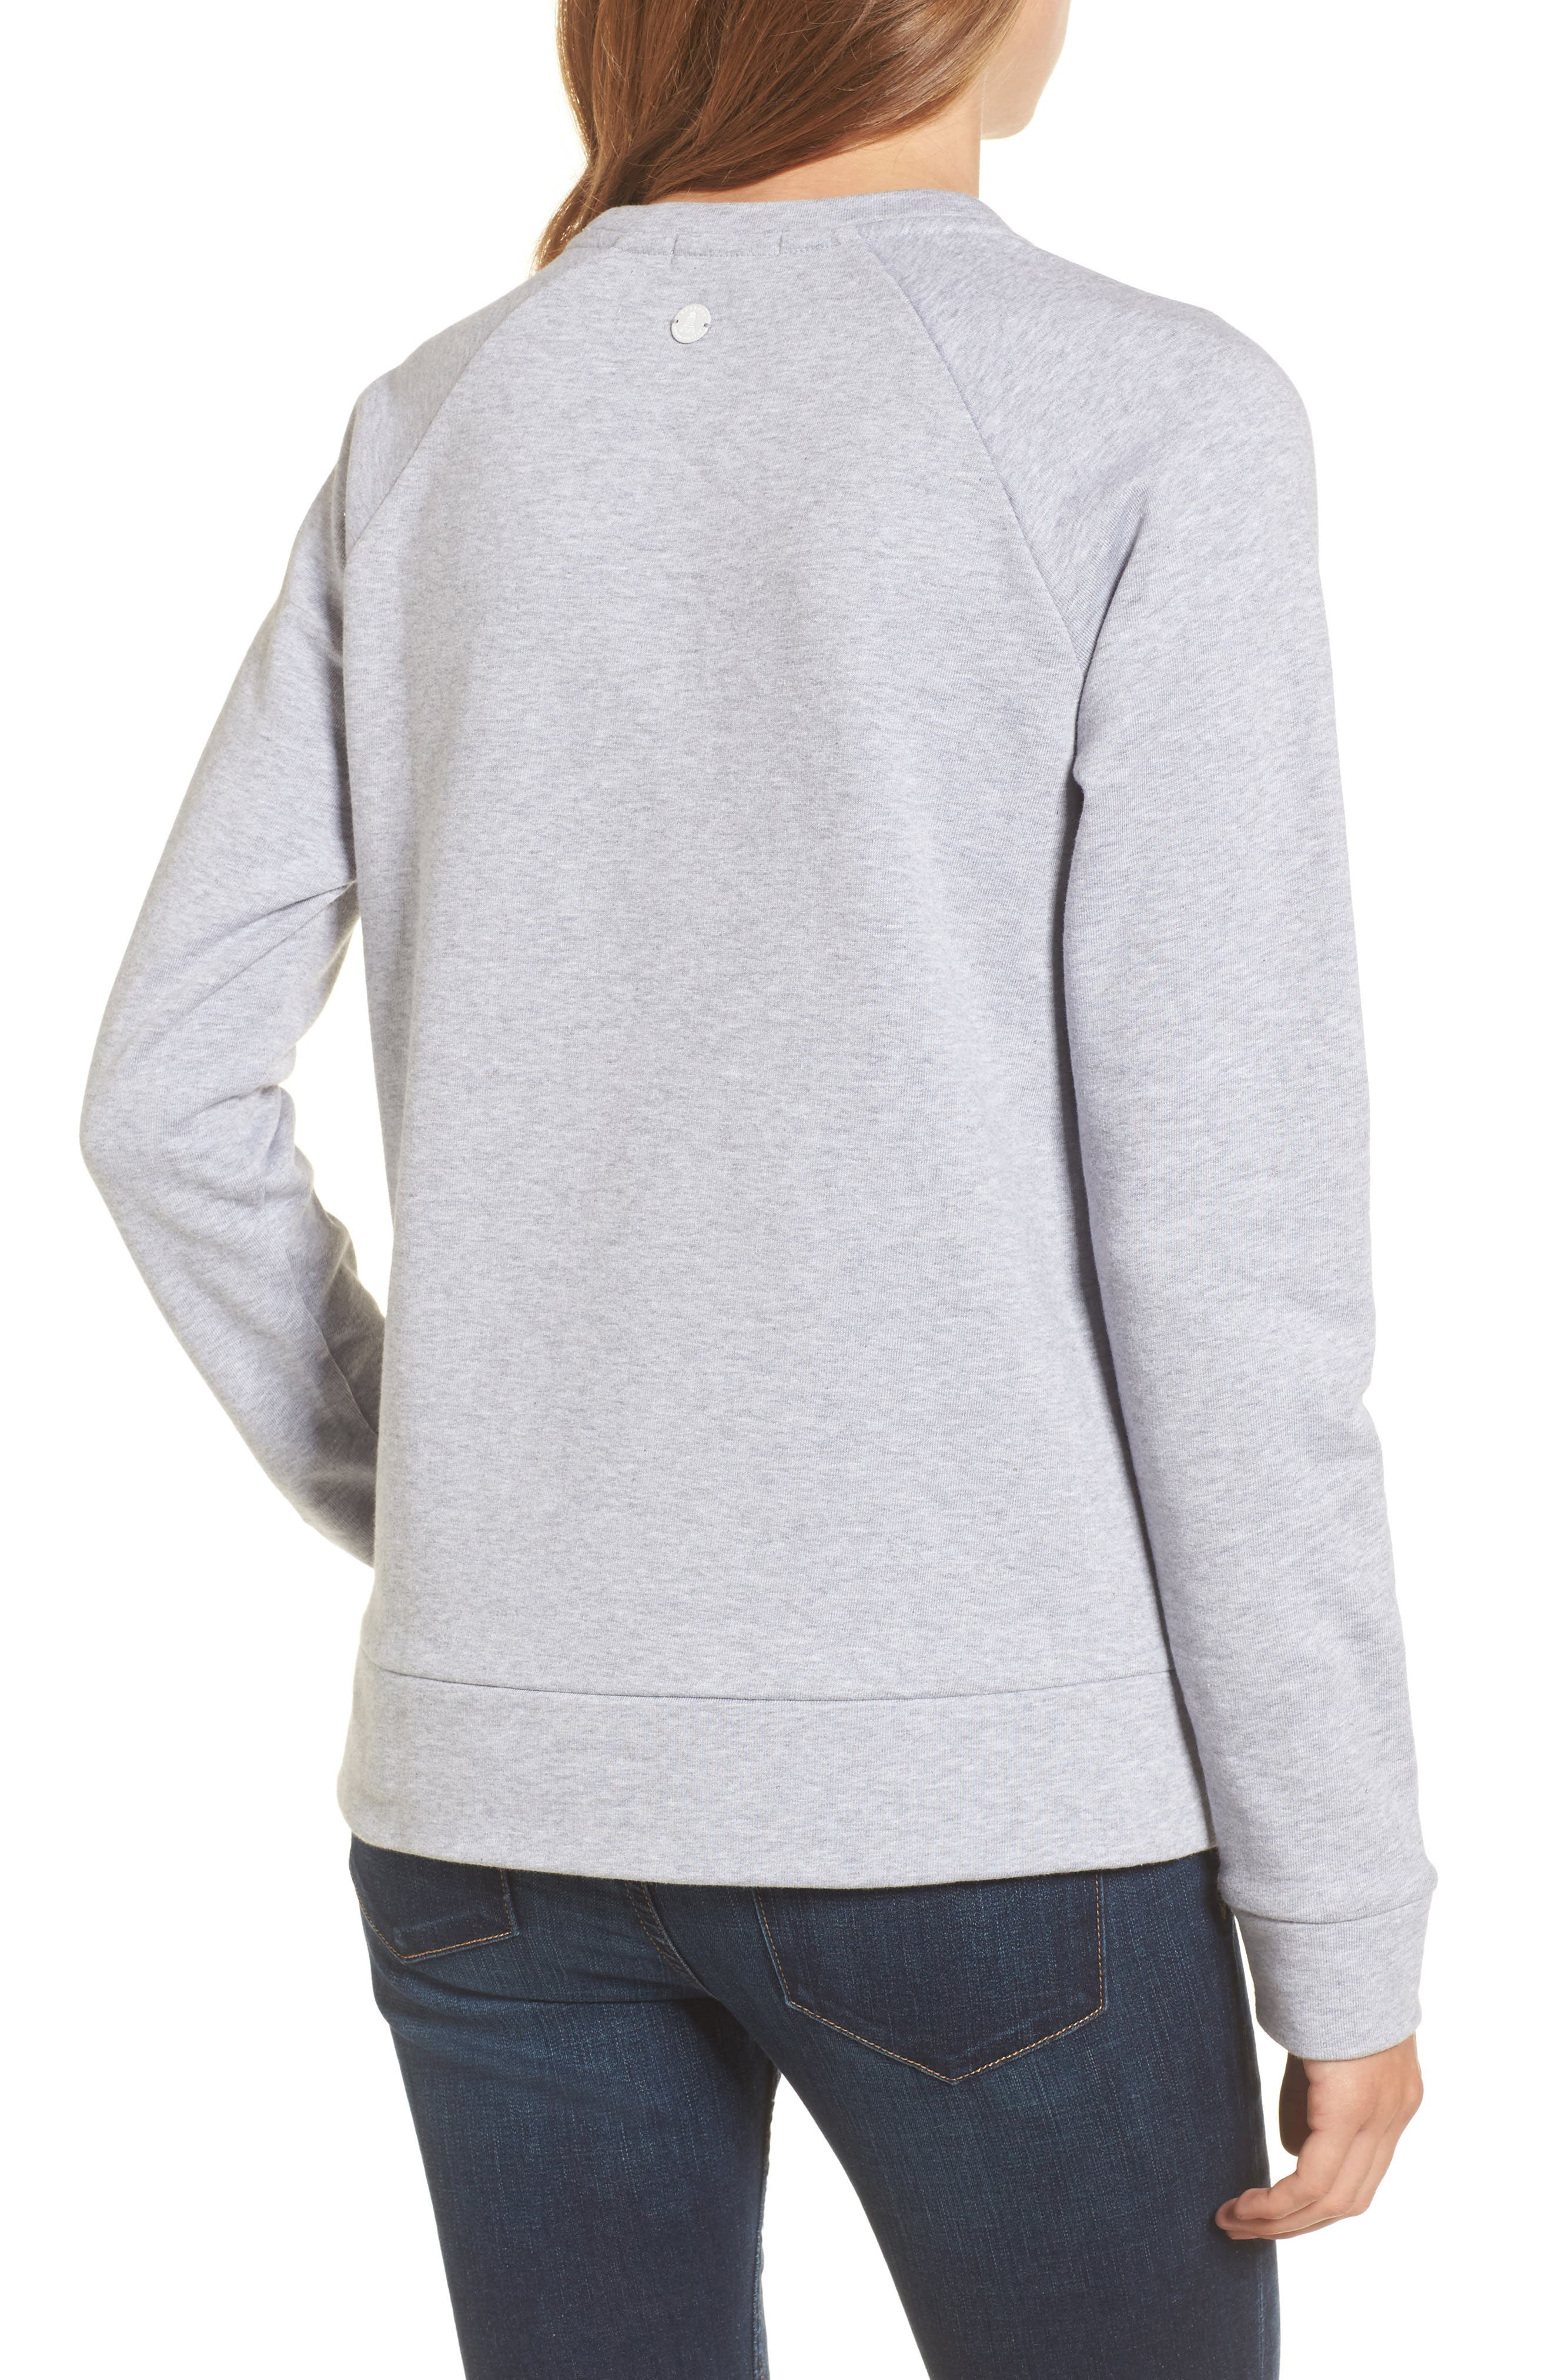 Wester Sweatshirt,                             Alternate thumbnail 2, color,                             Light Grey